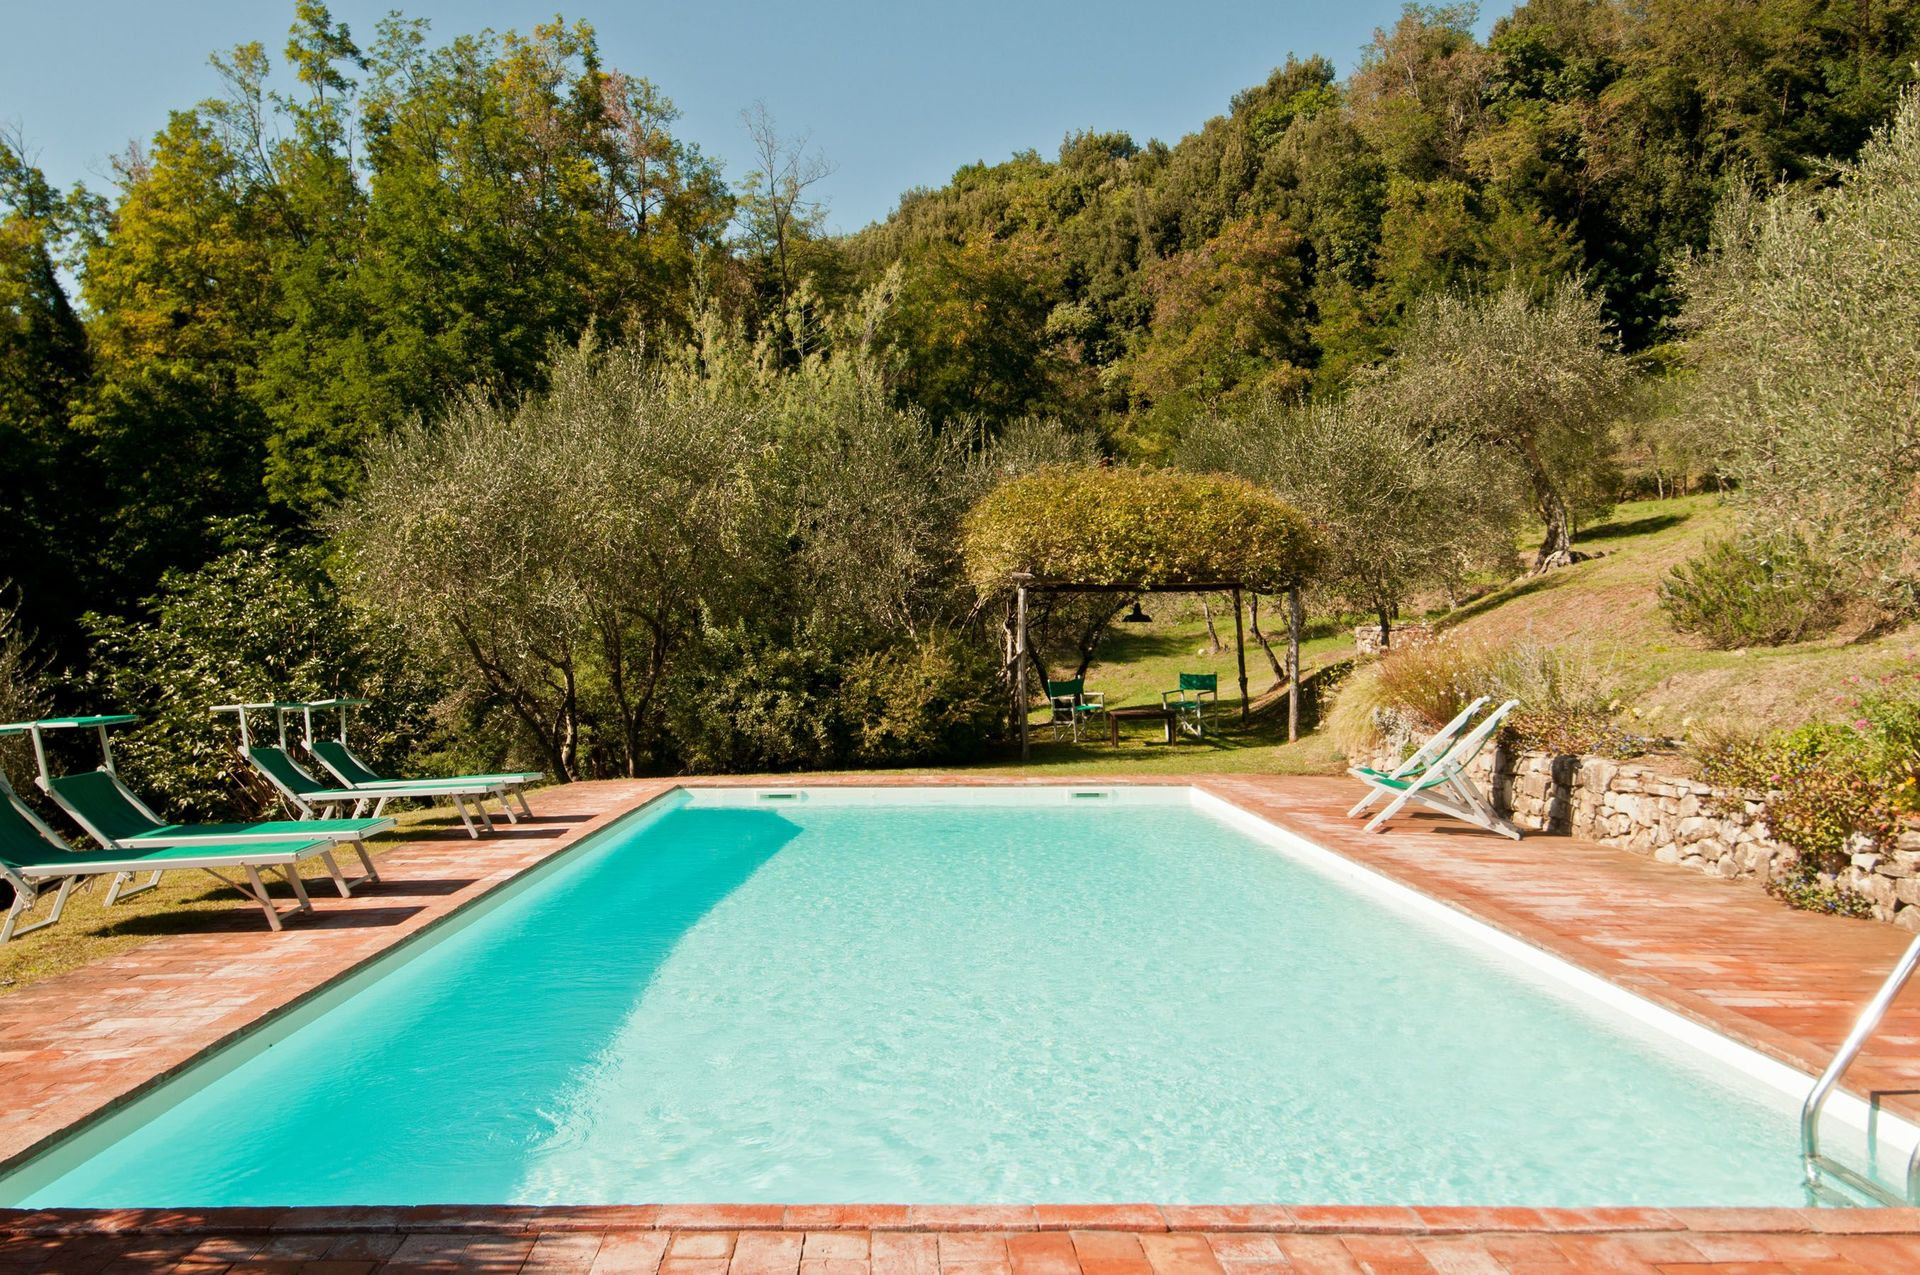 Plan Ou Photo Pool House Pour Piscine damiano villa in tuscany lucca - salogi villas, italy